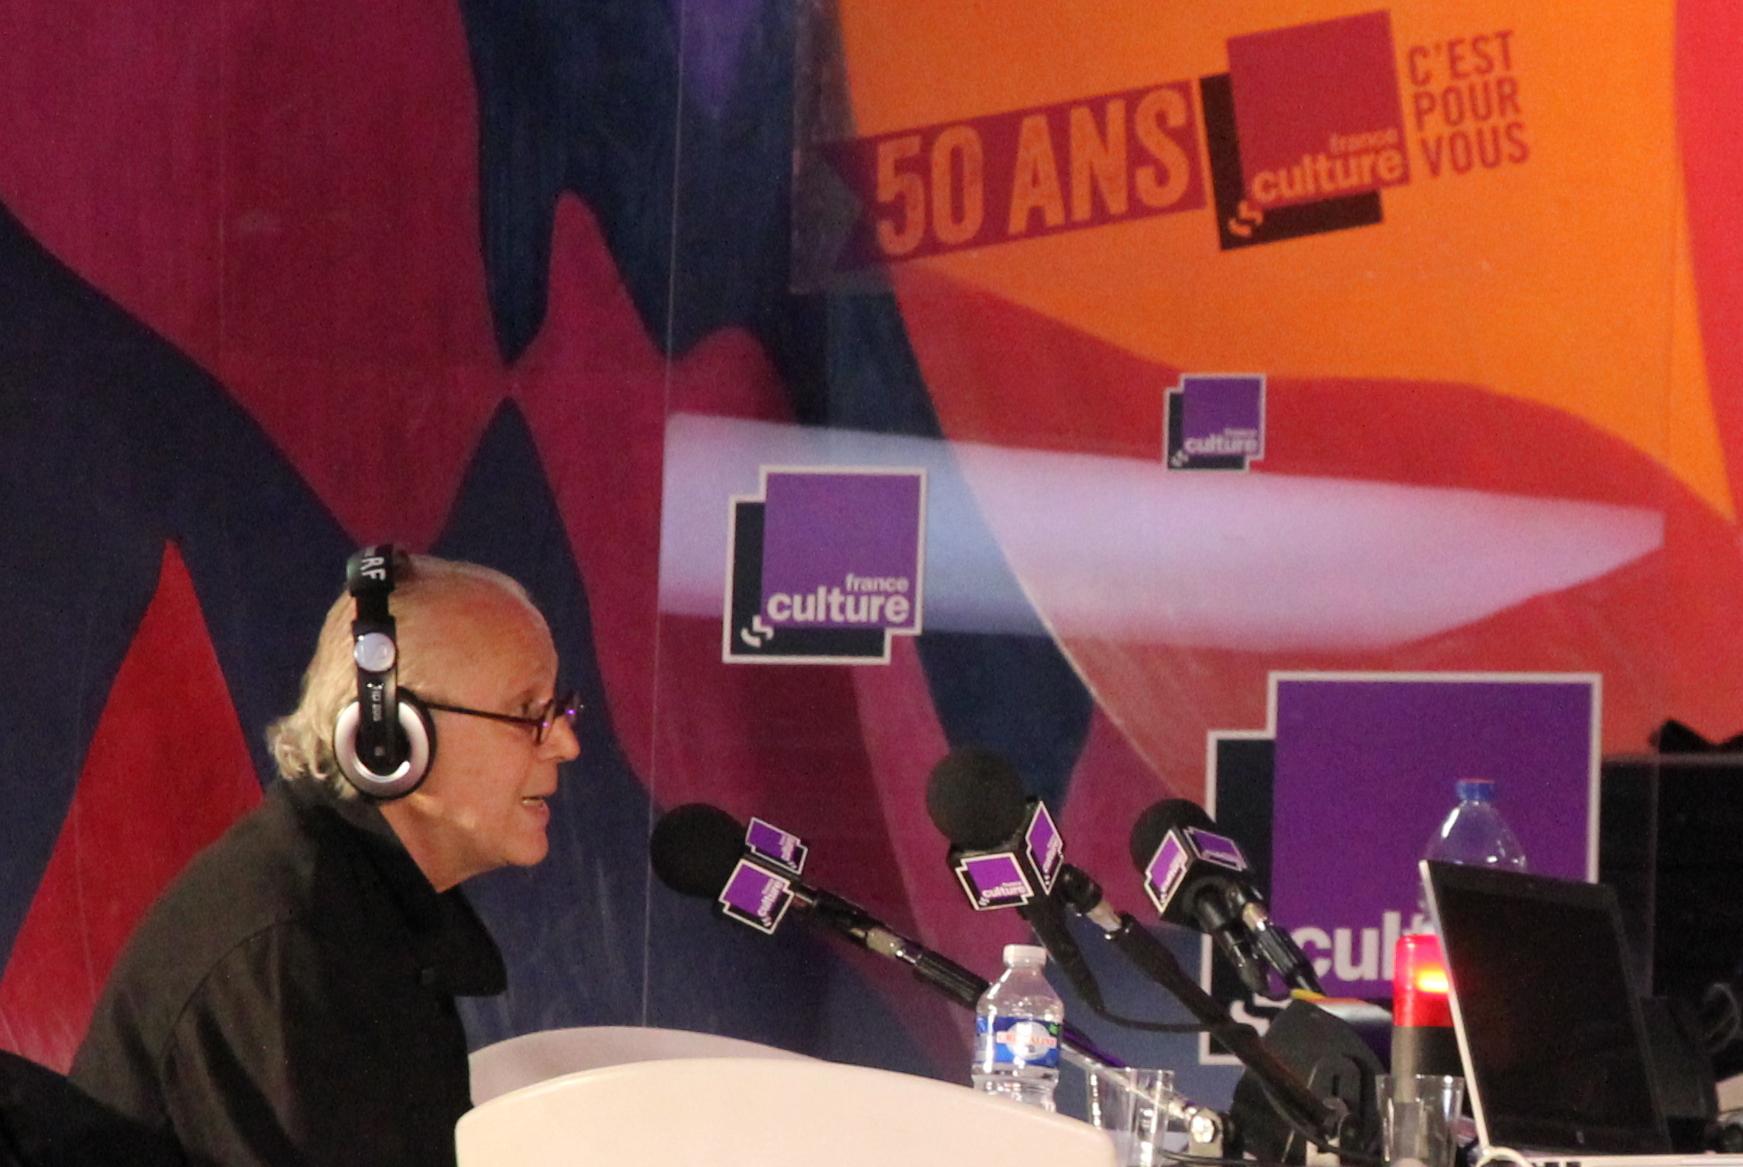 Les 50 ans de France Culture